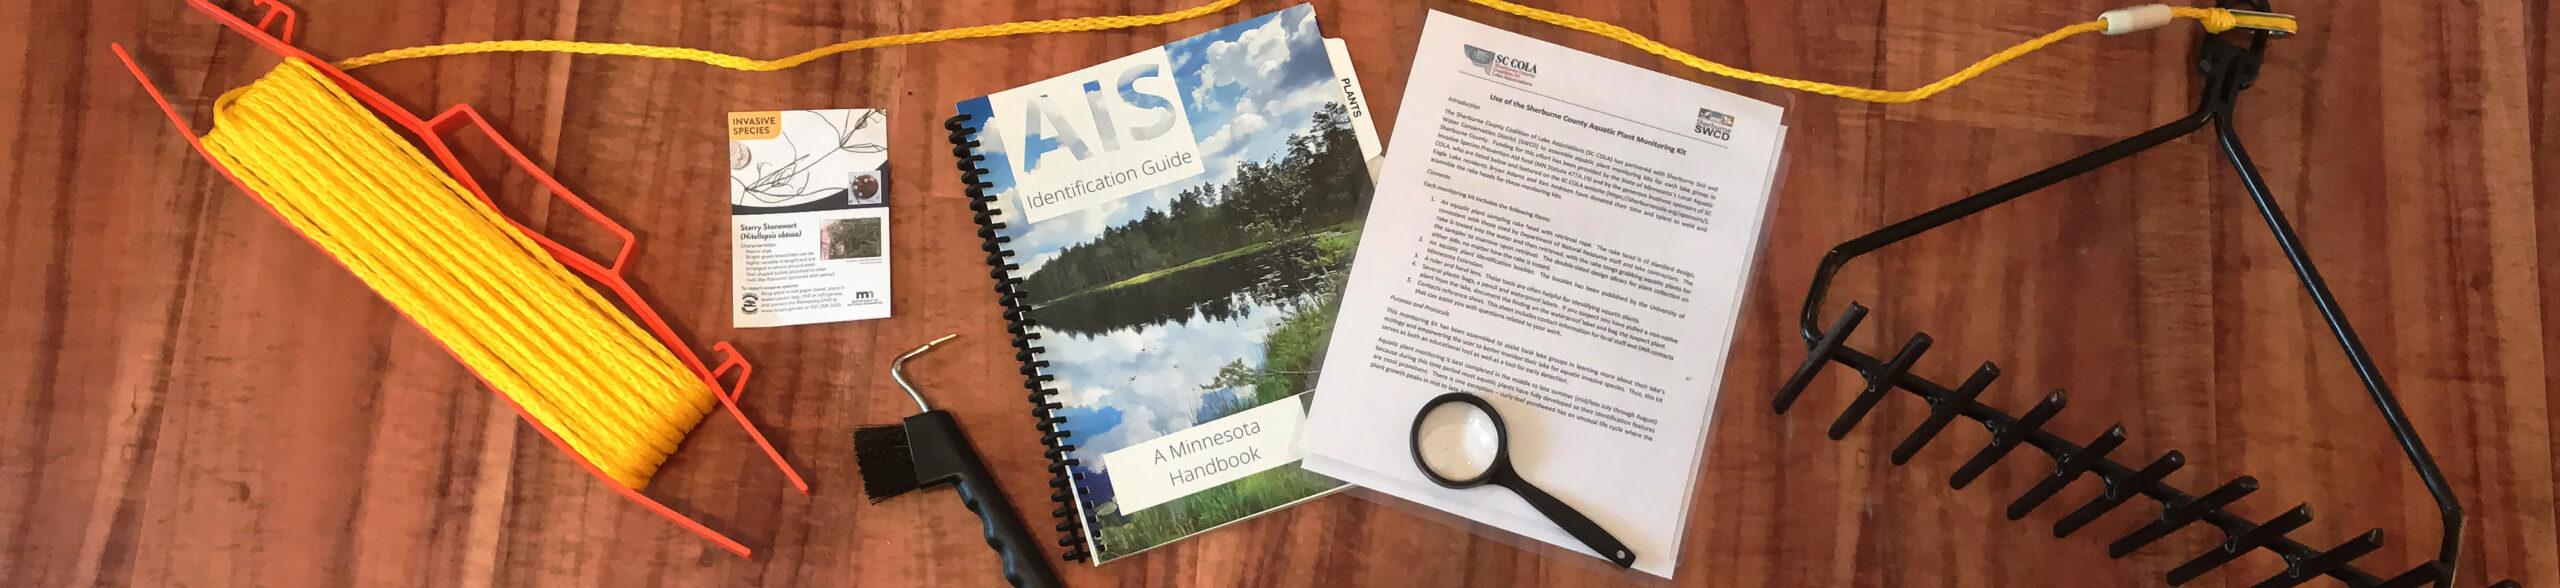 Aquatic Invasive Species rake kit